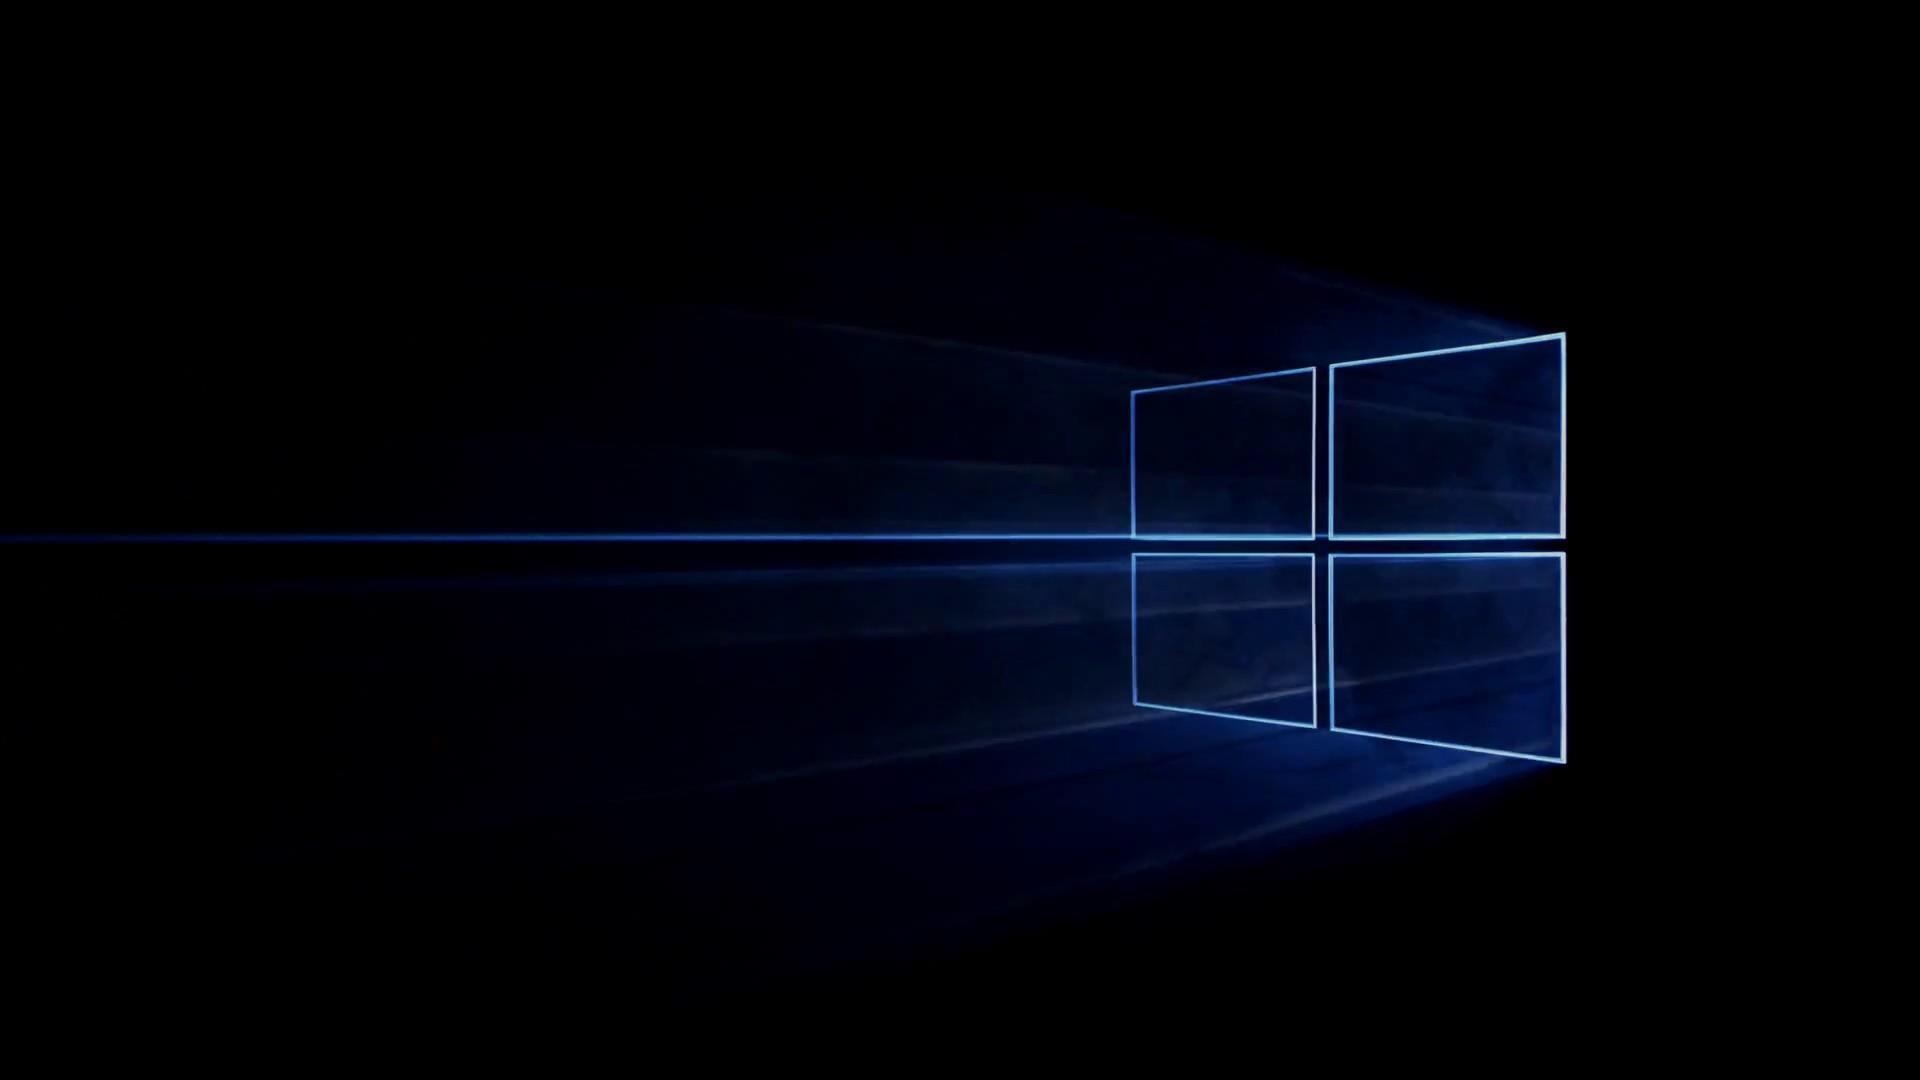 45 Windows 10 Logo Animated Wallpaper On Wallpapersafari